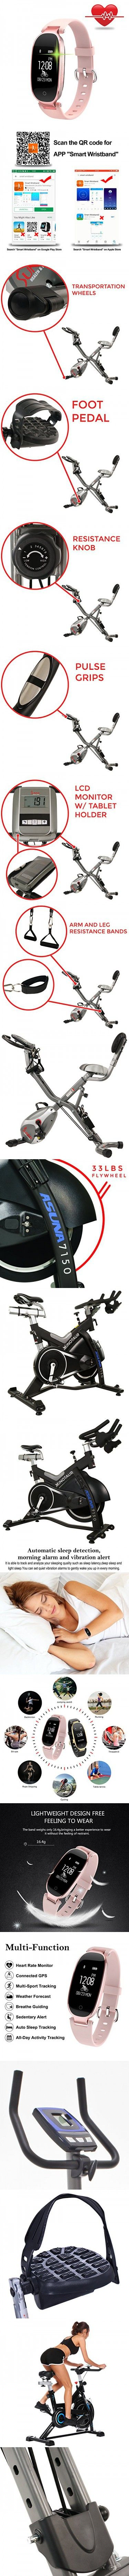 Fitness Tracker Wowgo Women Sport Tracker Smart Watch Band Bracelet Heart Rate Monitor Smart Bracelet Wristband W Biking Workout Medicine Balls Medicine Ball